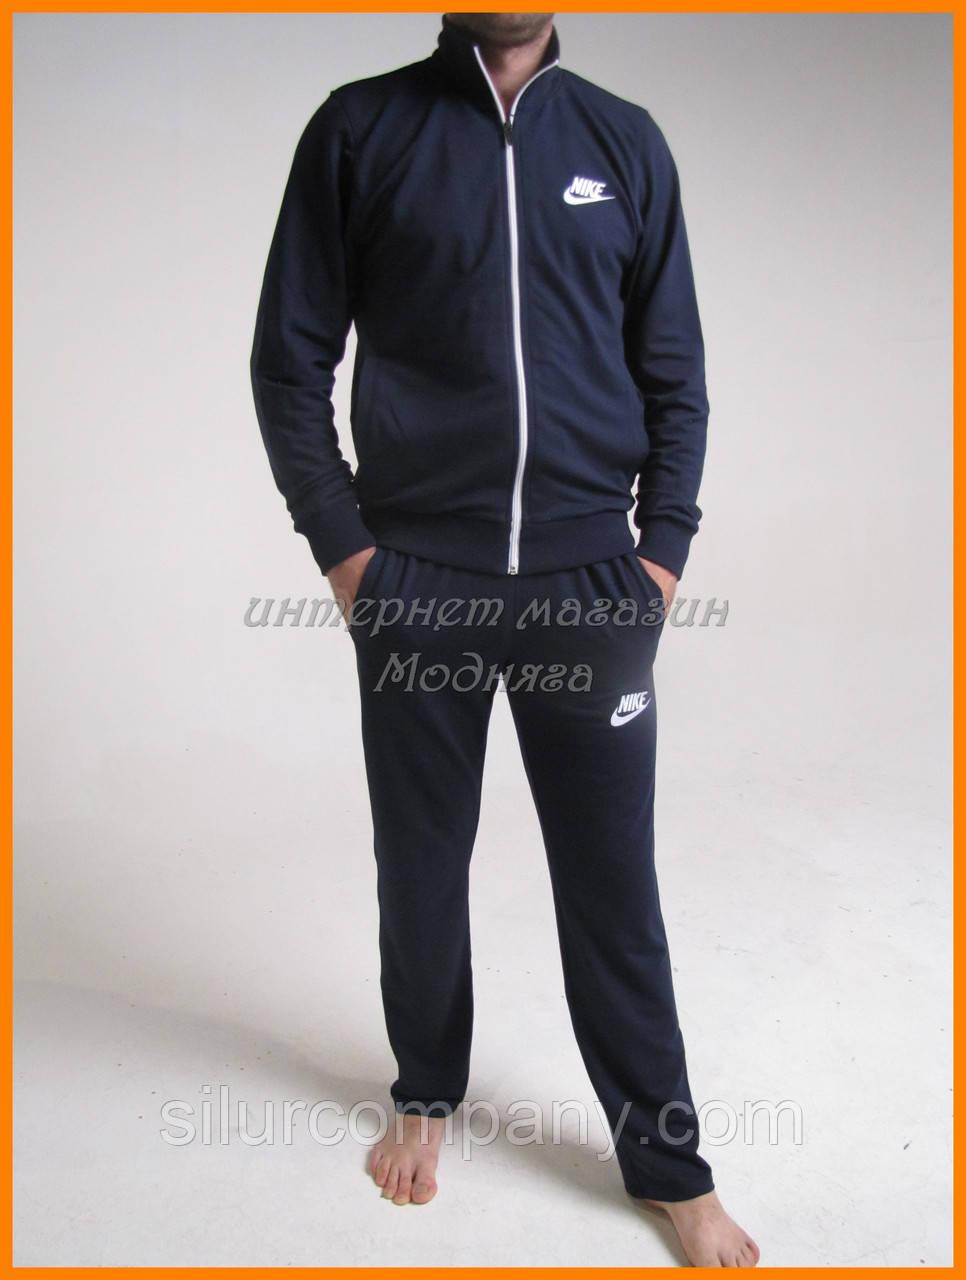 e1deee19 Мужской спортивный костюм Nike трикотажный цвет темно-синий - Интернет  магазин